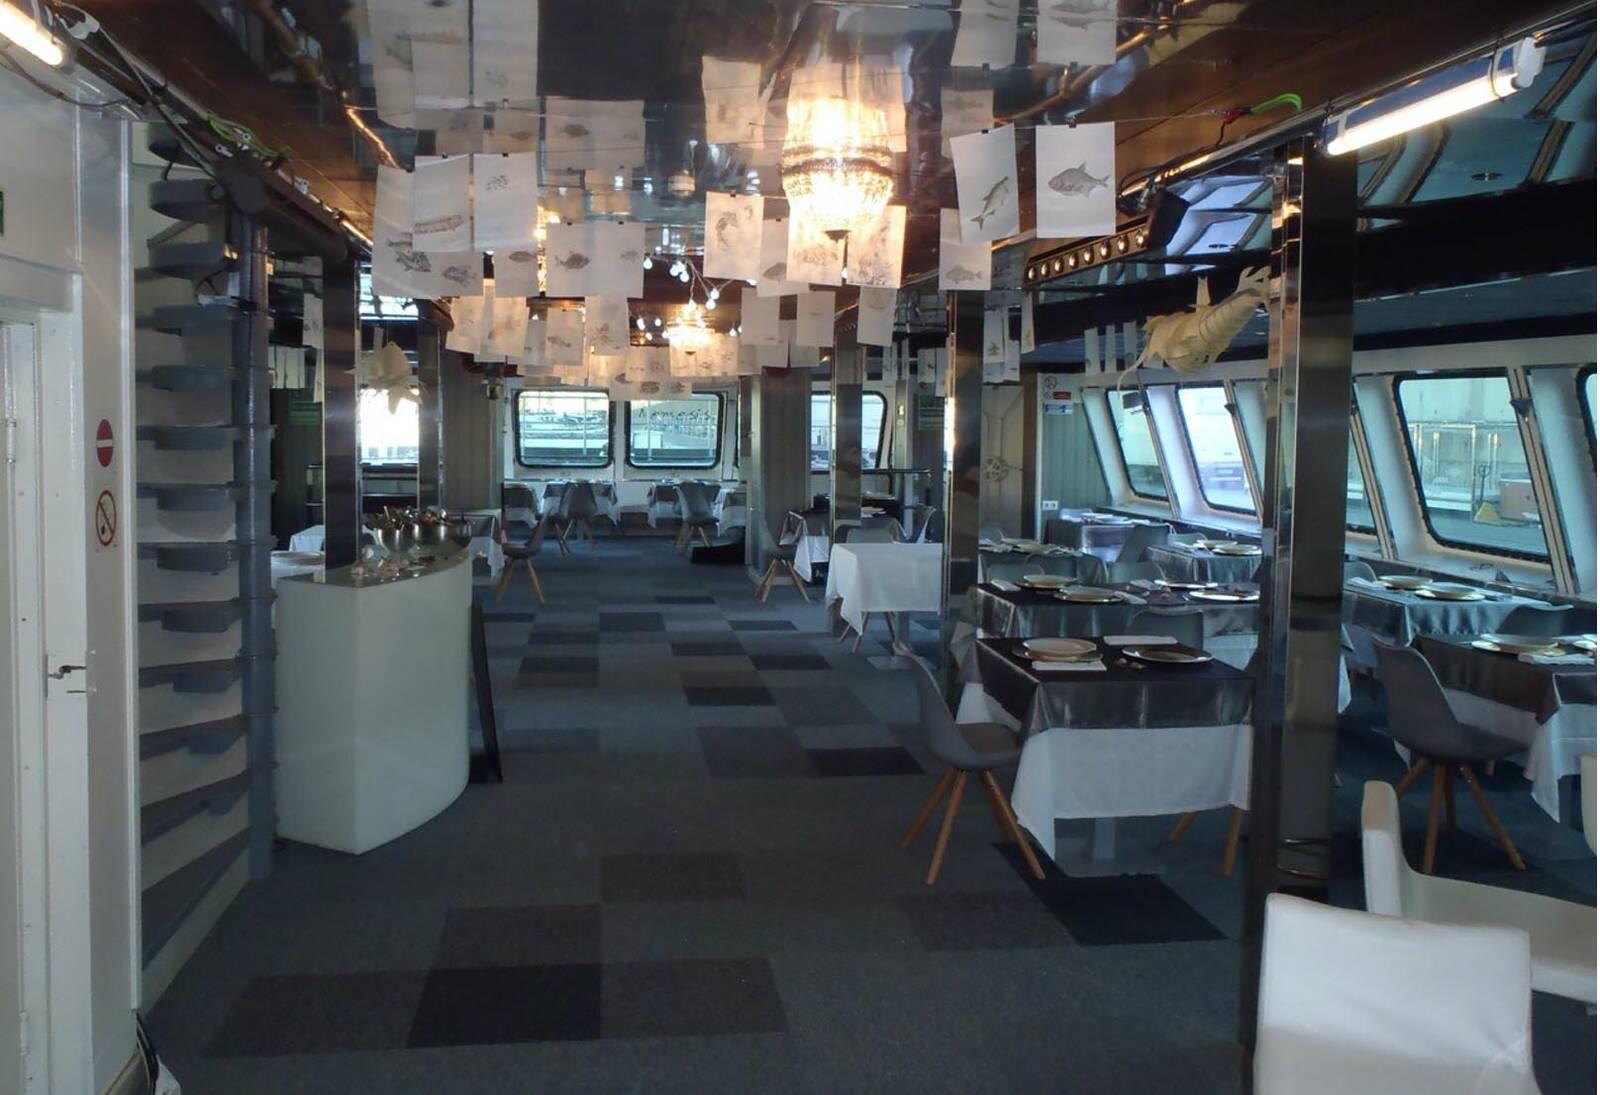 Resteraun caf Restaurant Club Ship Disco Boat For Sale